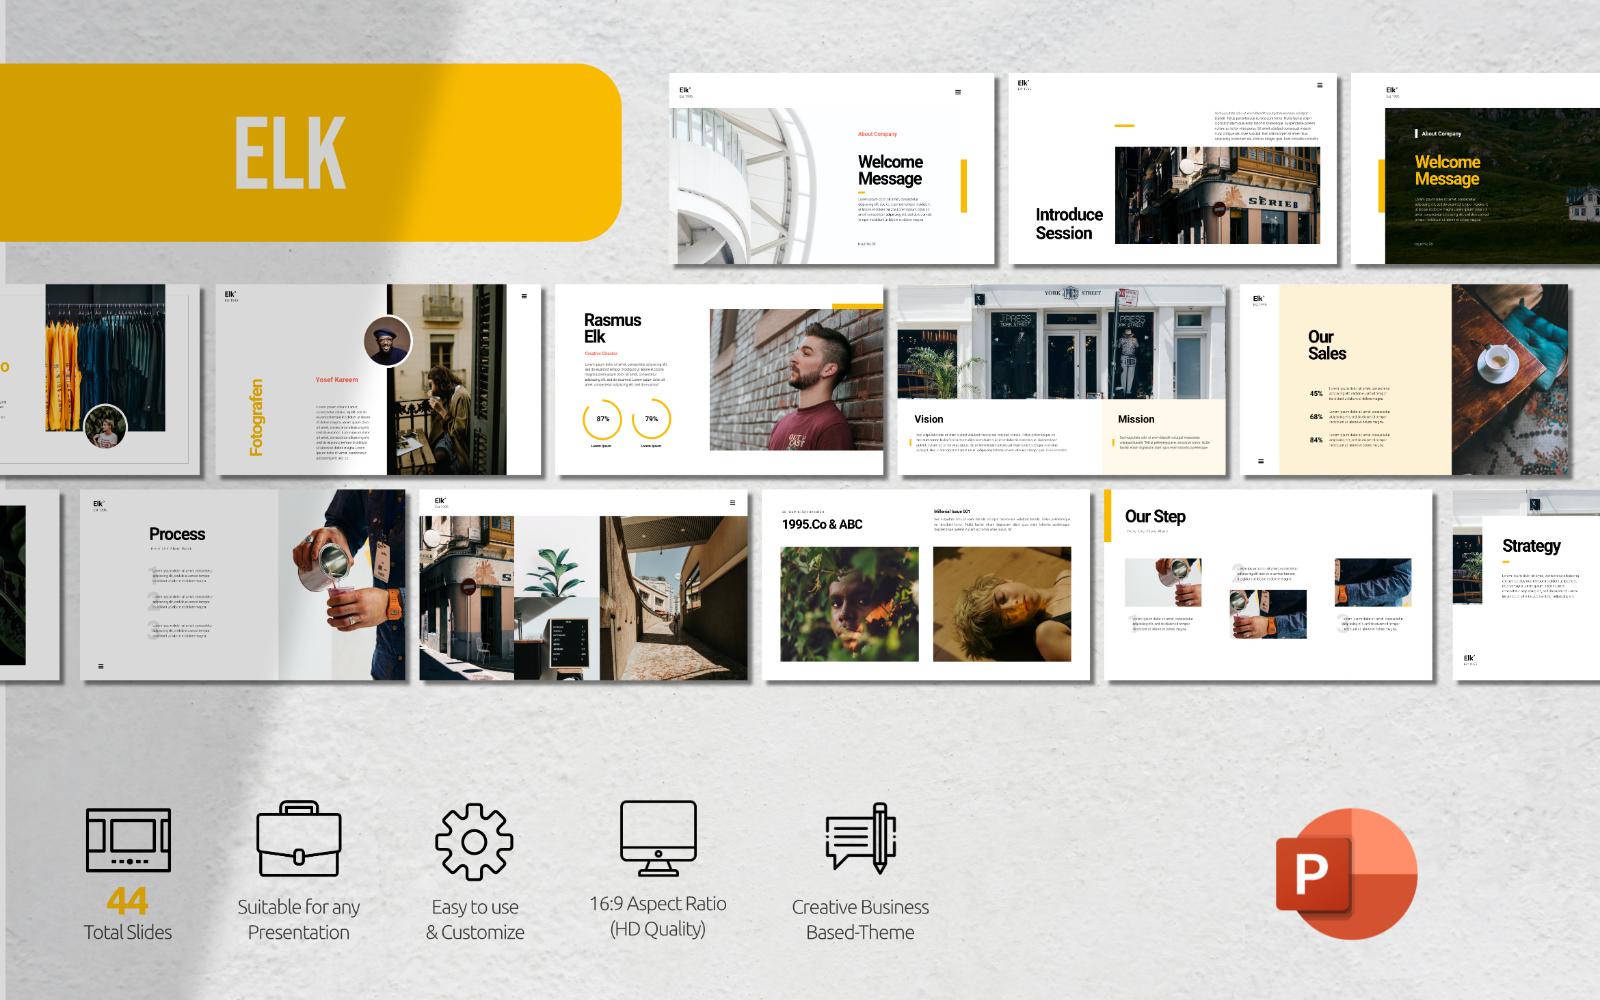 Elk - Minimalist Presentation - Powerpoint Template